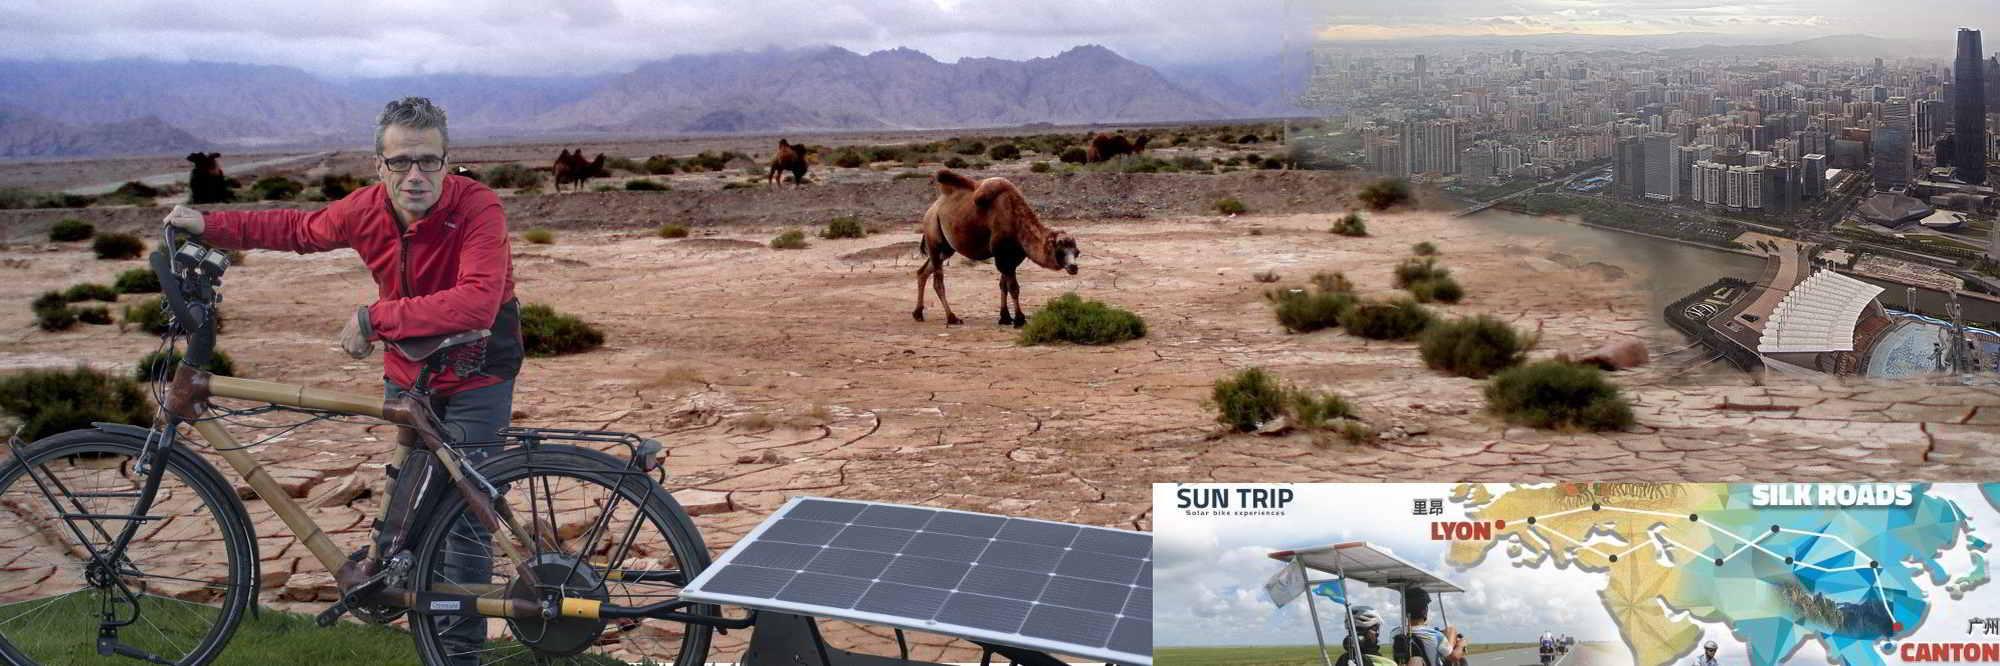 header foto solar trip